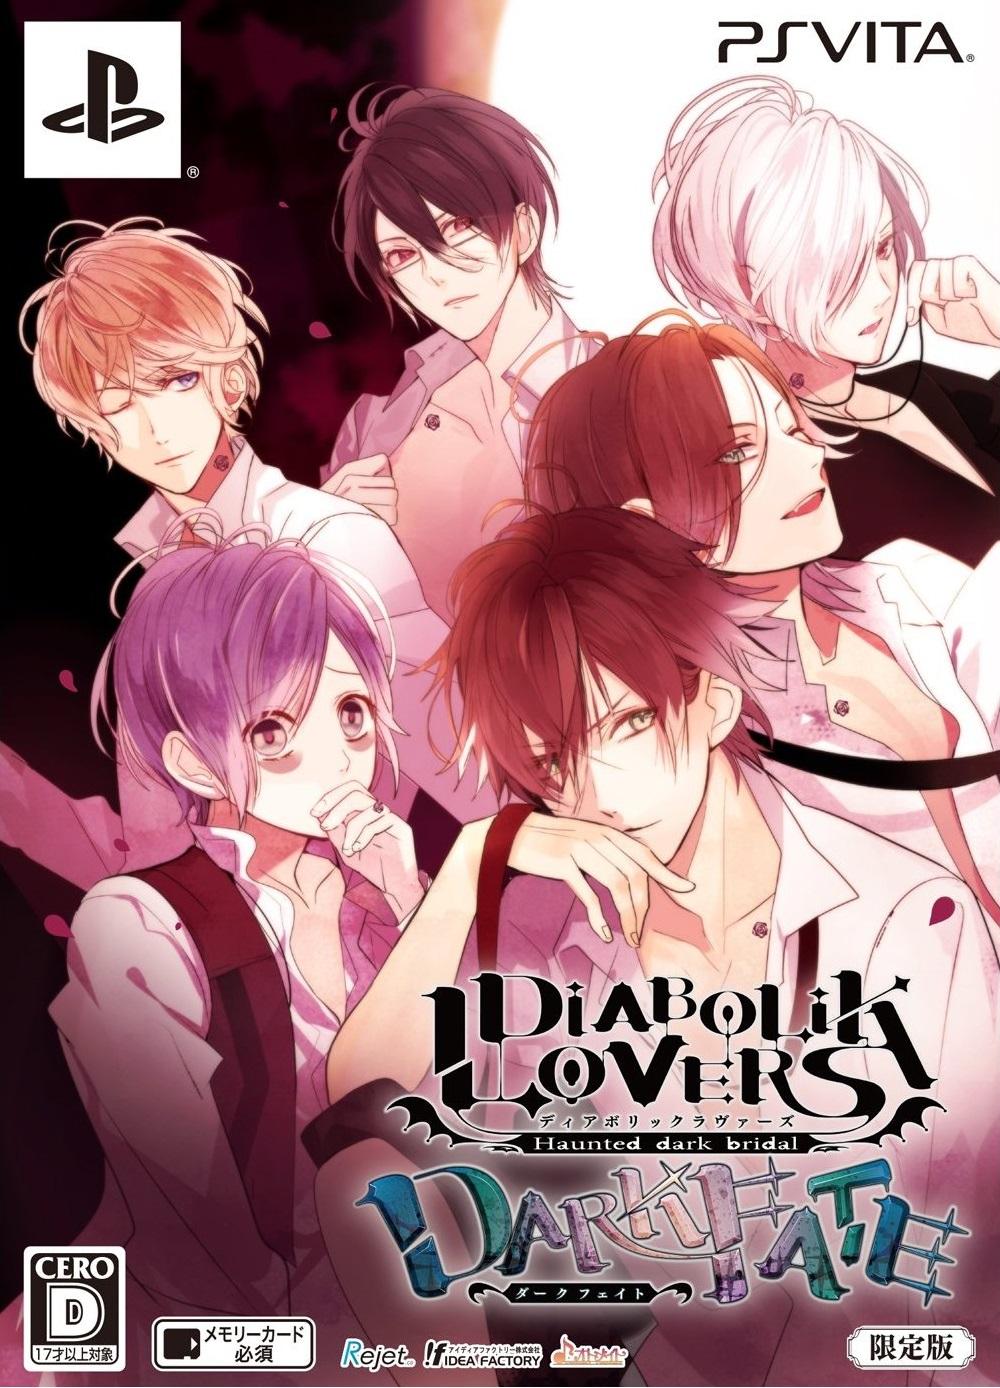 Diabolik Lovers DARK FATE Limited Edition